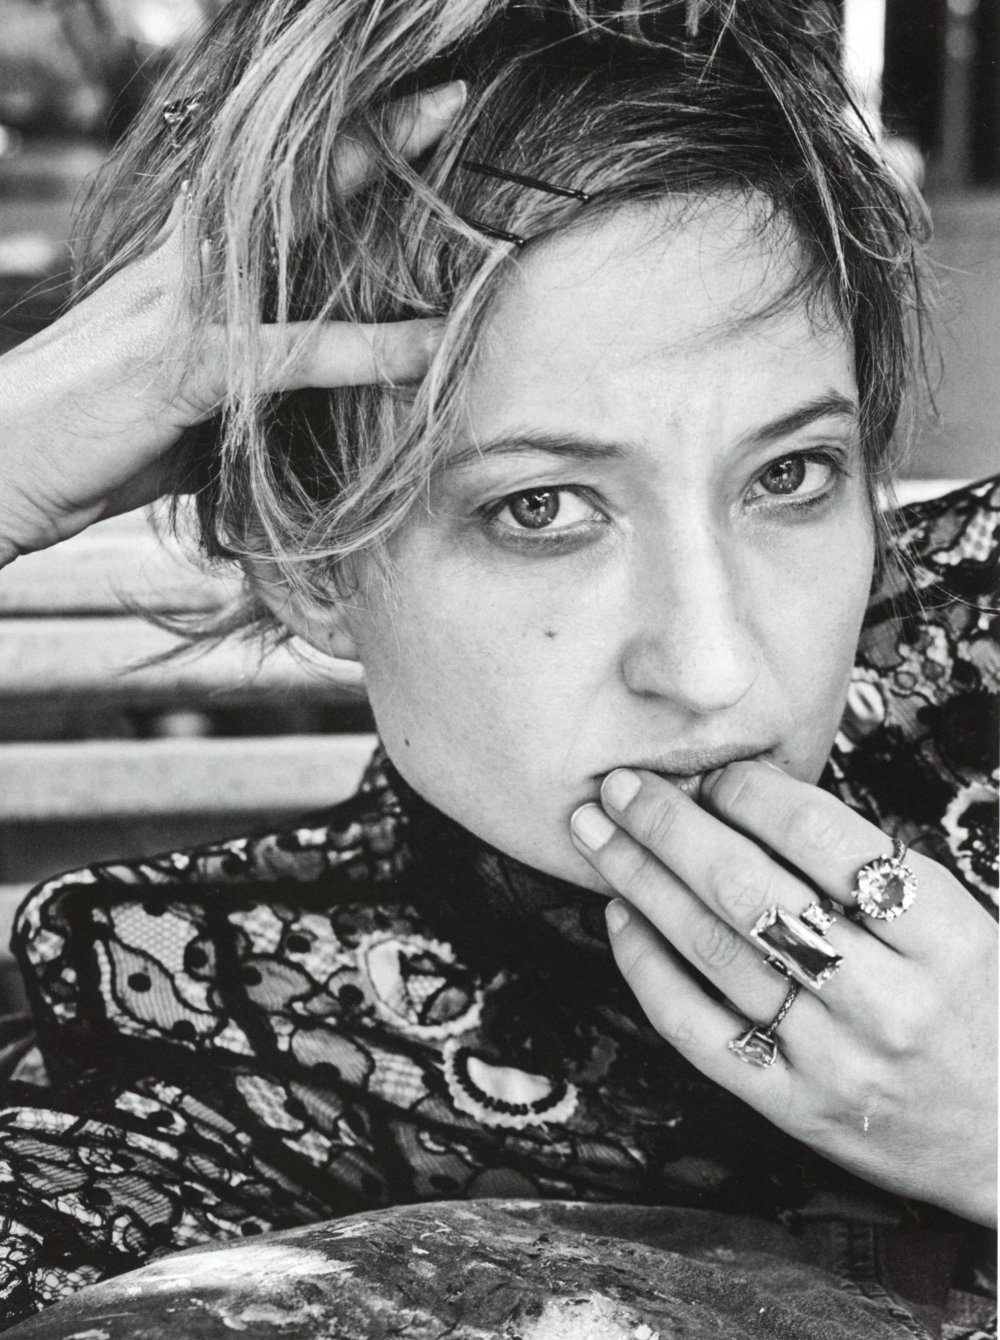 Lily James (born 1989),Ruma Guha Thakurta Hot videos Femi Benussi (born 1945 (born in Rovinj in modern Croatia,Ray Winstone (born 1957)